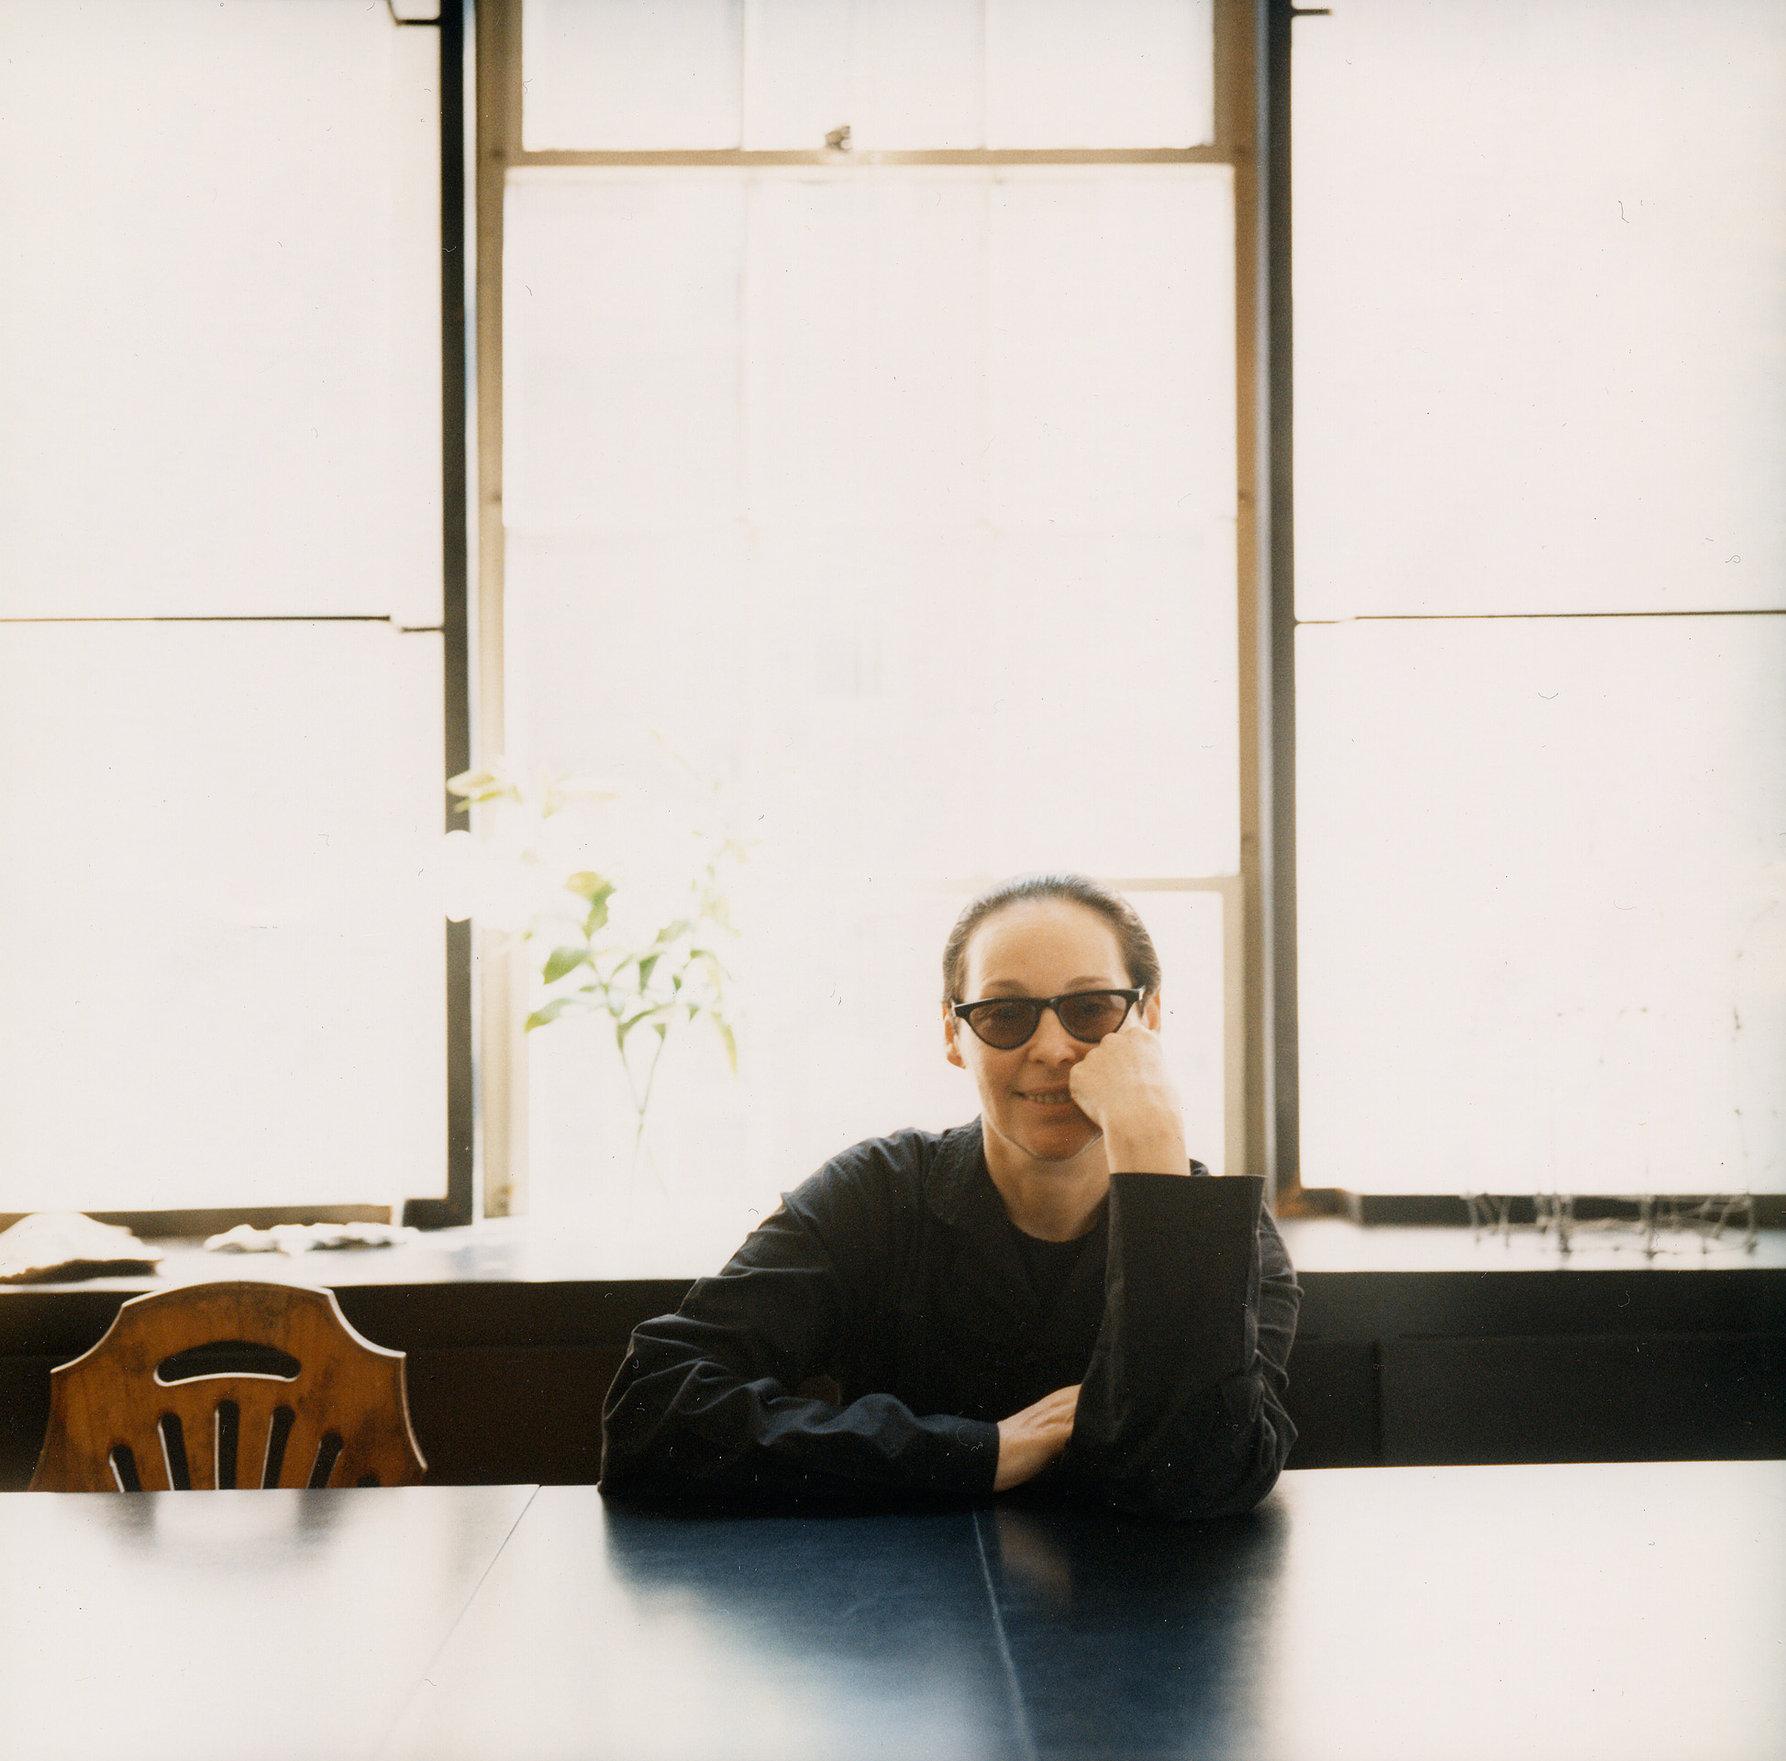 ROXANE LEWITT-NYC-USA 1997